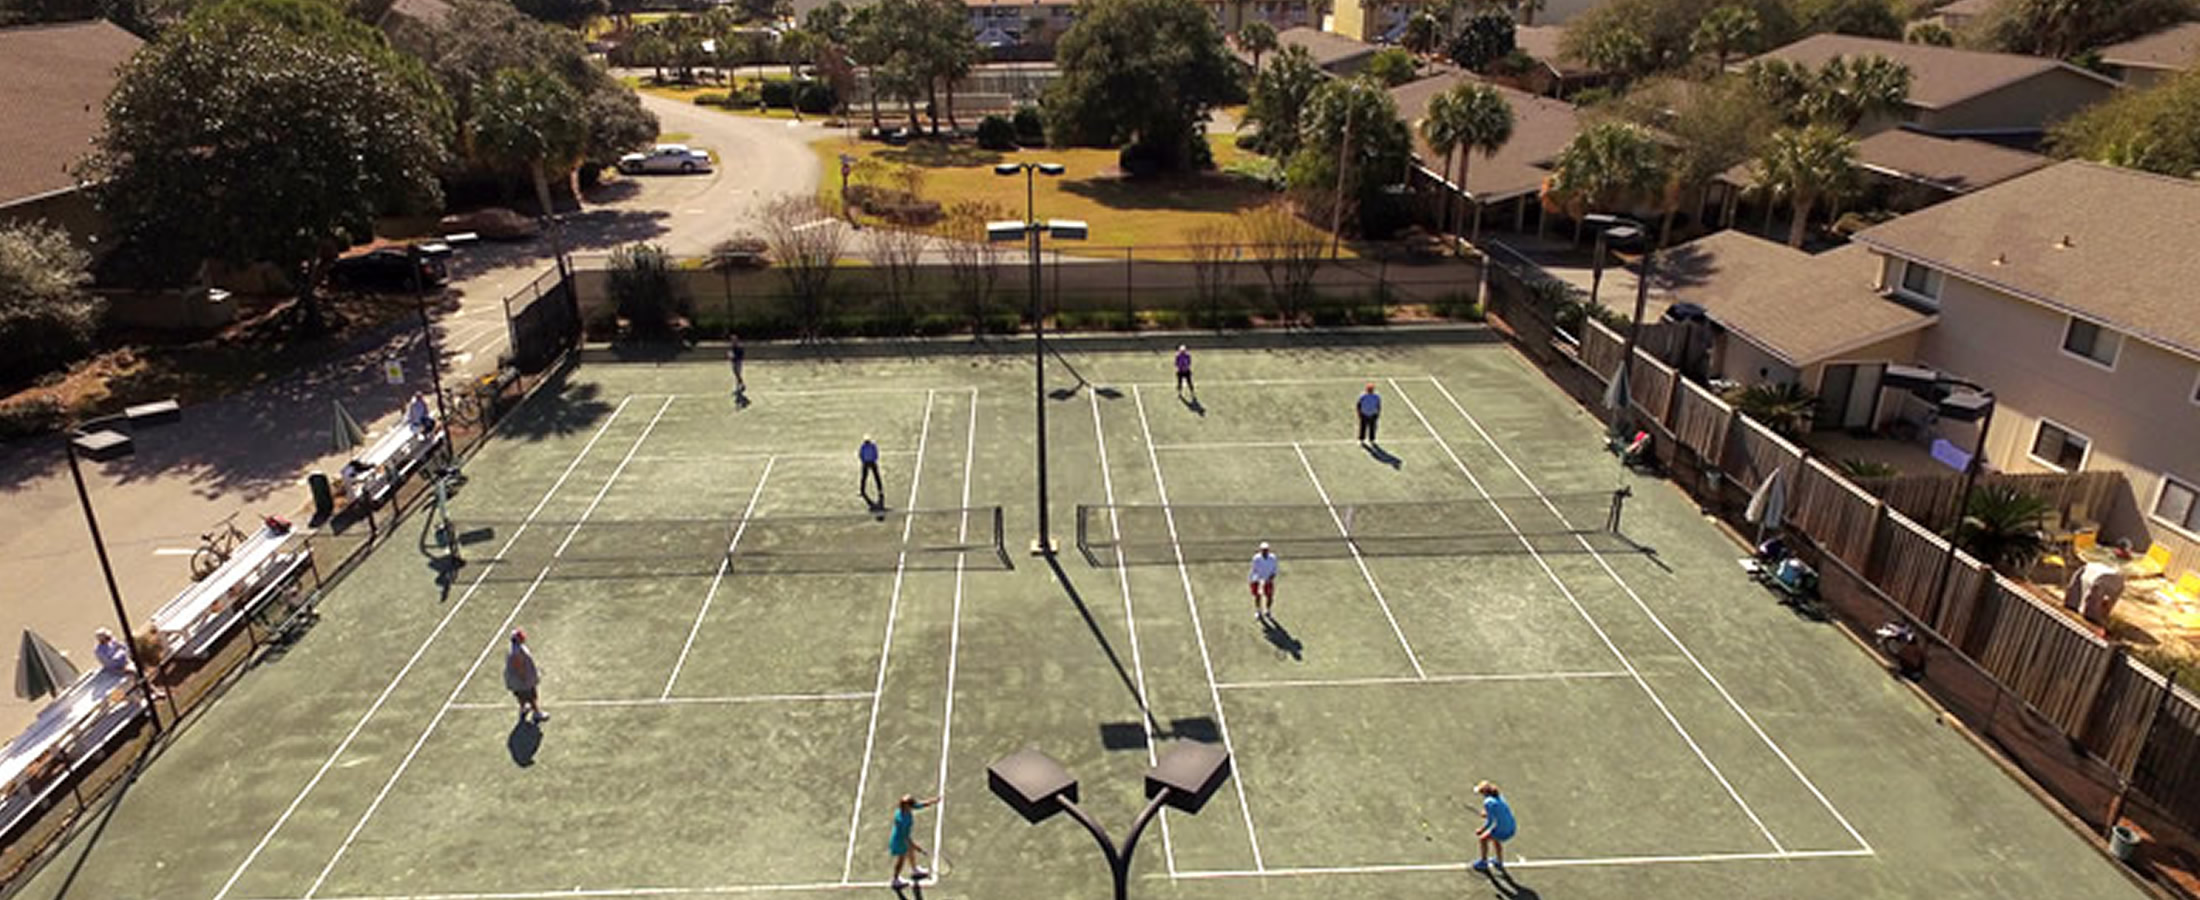 Tennis at Seascape Resort